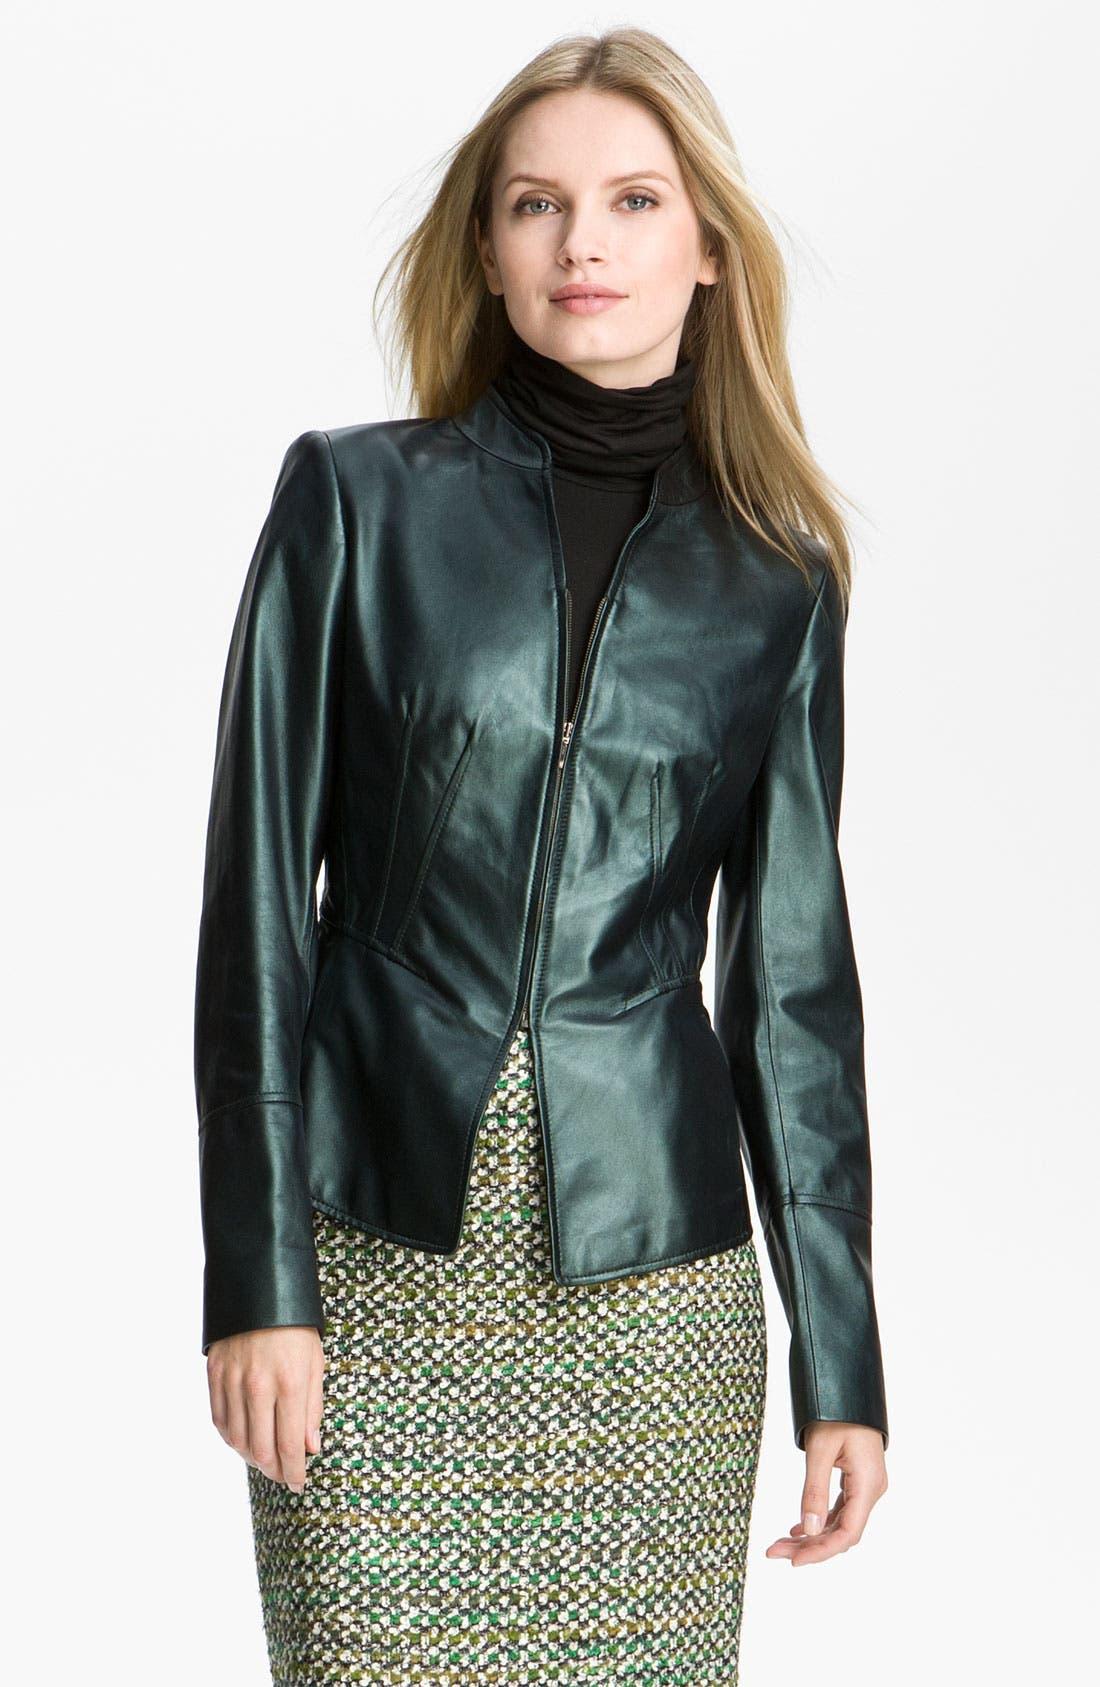 Alternate Image 1 Selected - Lafayette 148 New York Pearlized Leather Jacket